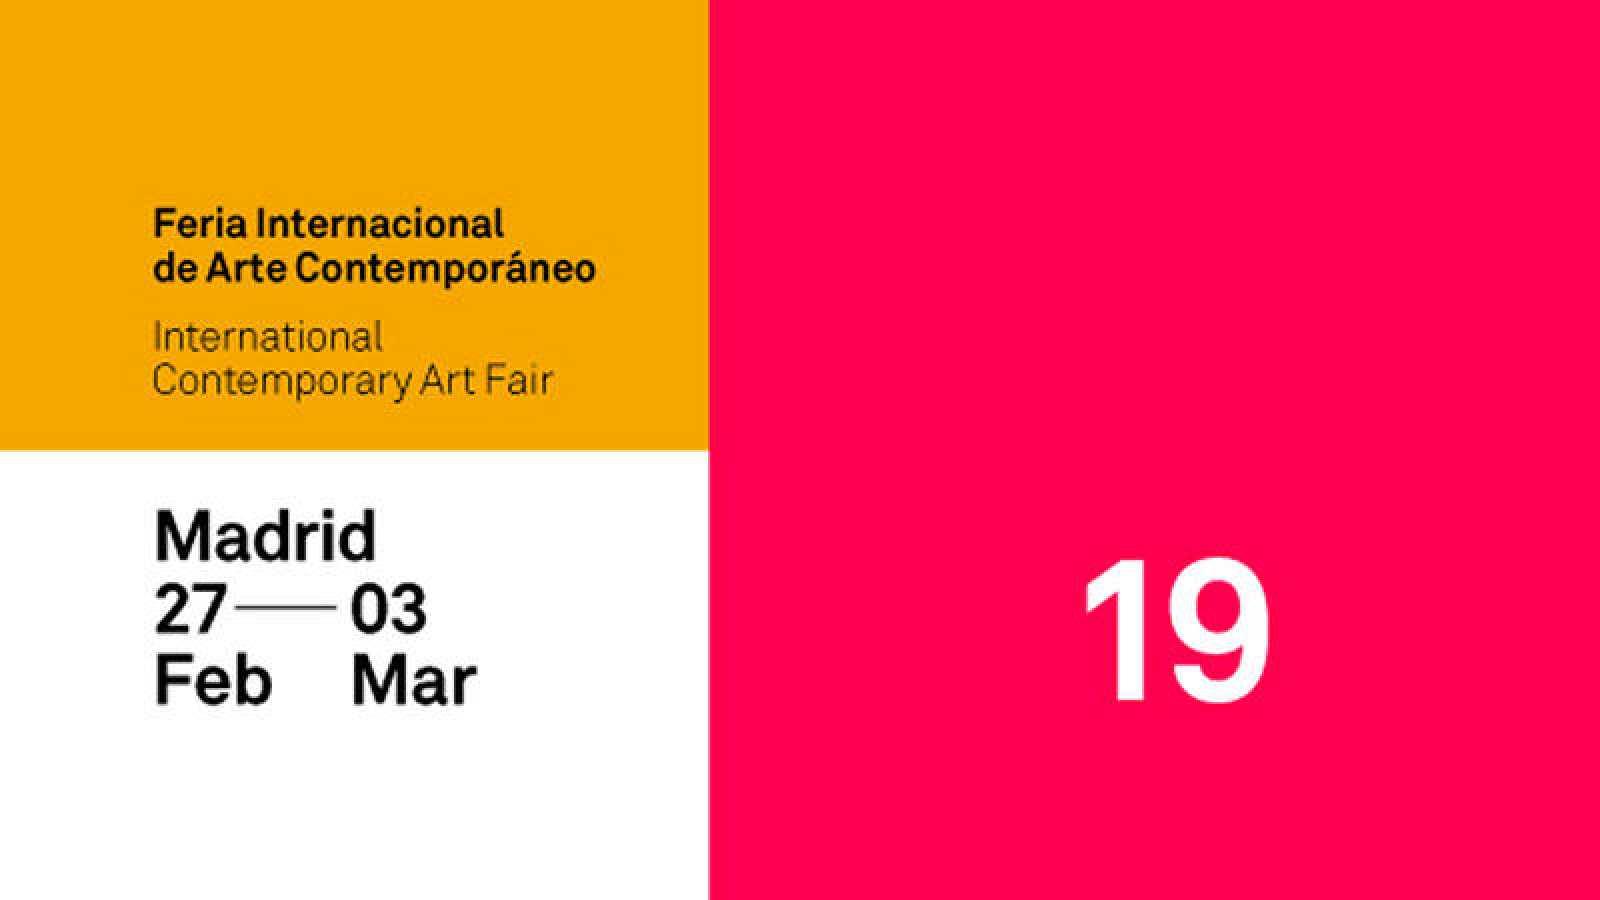 ARCO-2019-invitado-peru-Horno-Art-Virtual-Gallery-galeria-arte-fotografia-artistica-decoracion-edicion-limitada-1600x900